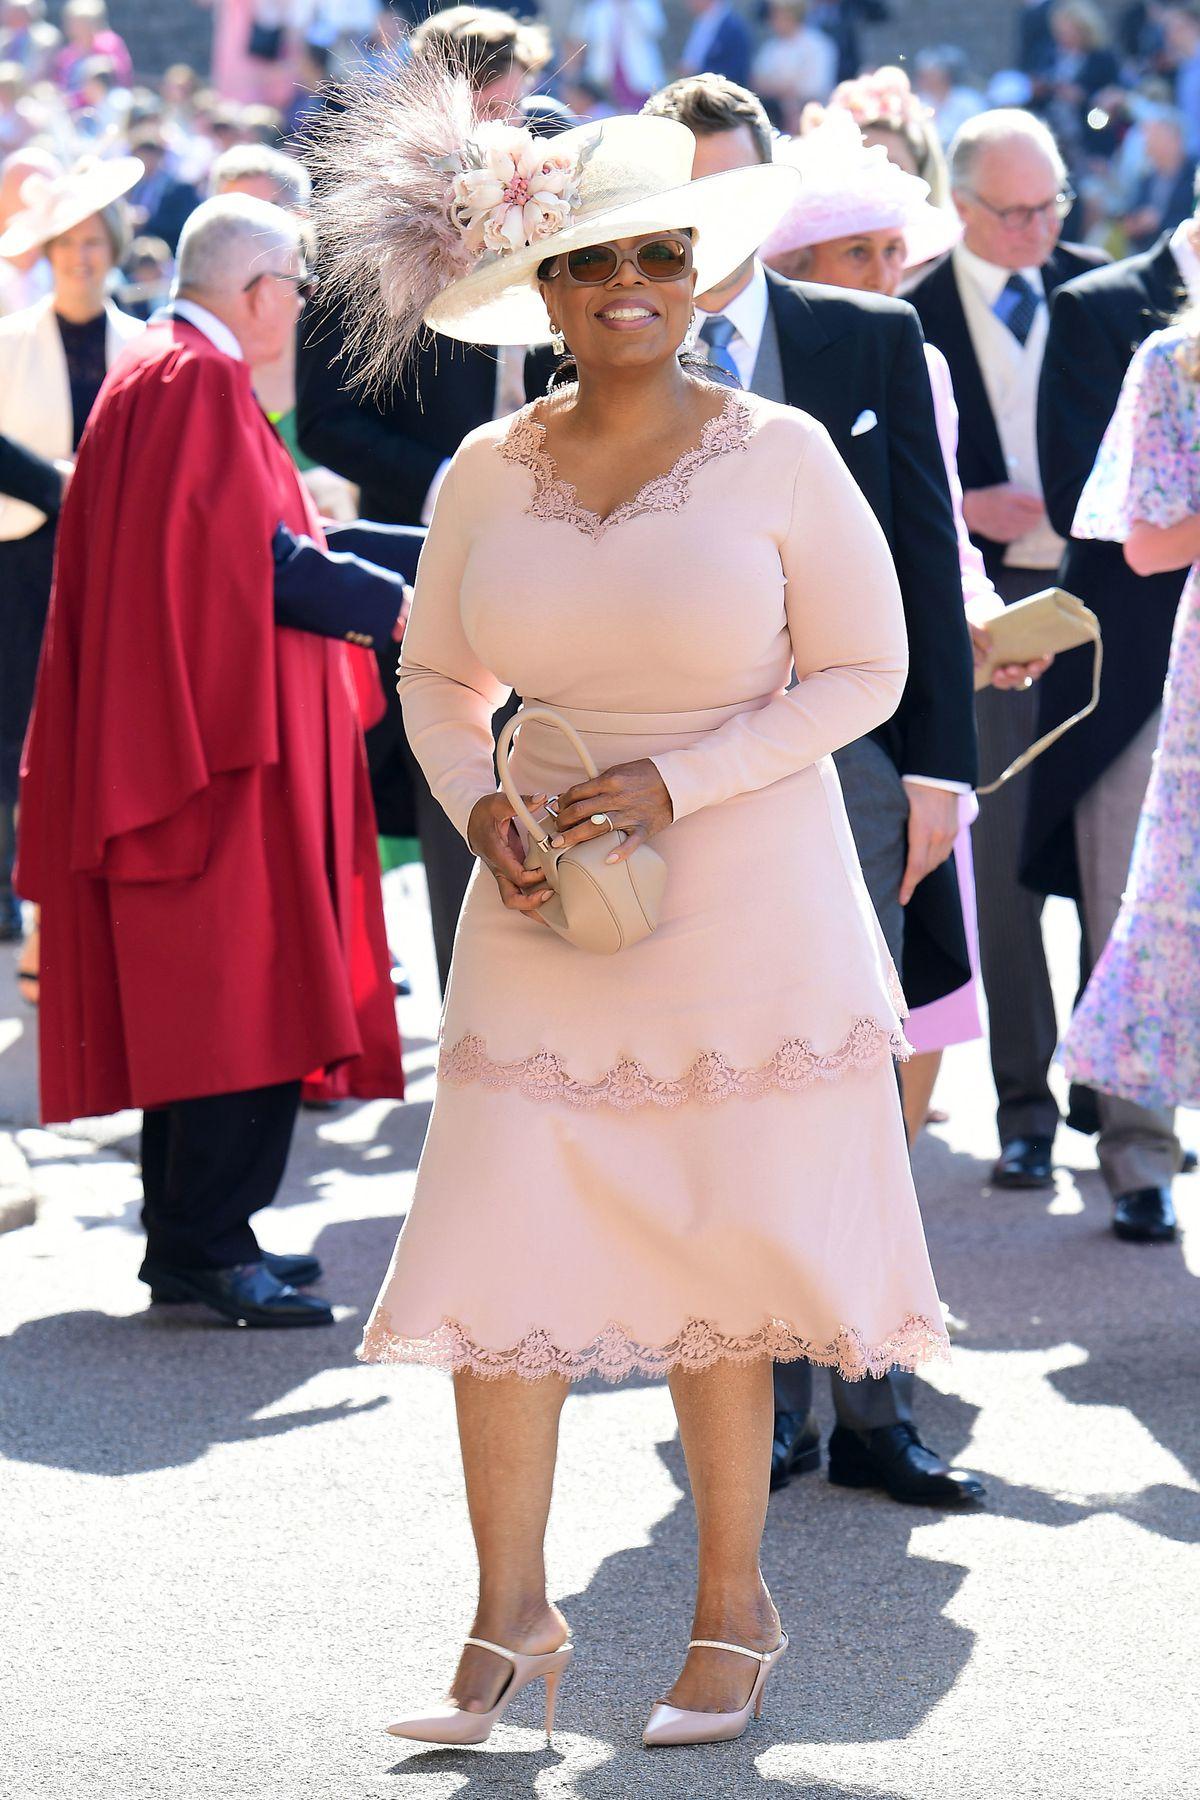 Oprah wears a blush-toned dress.